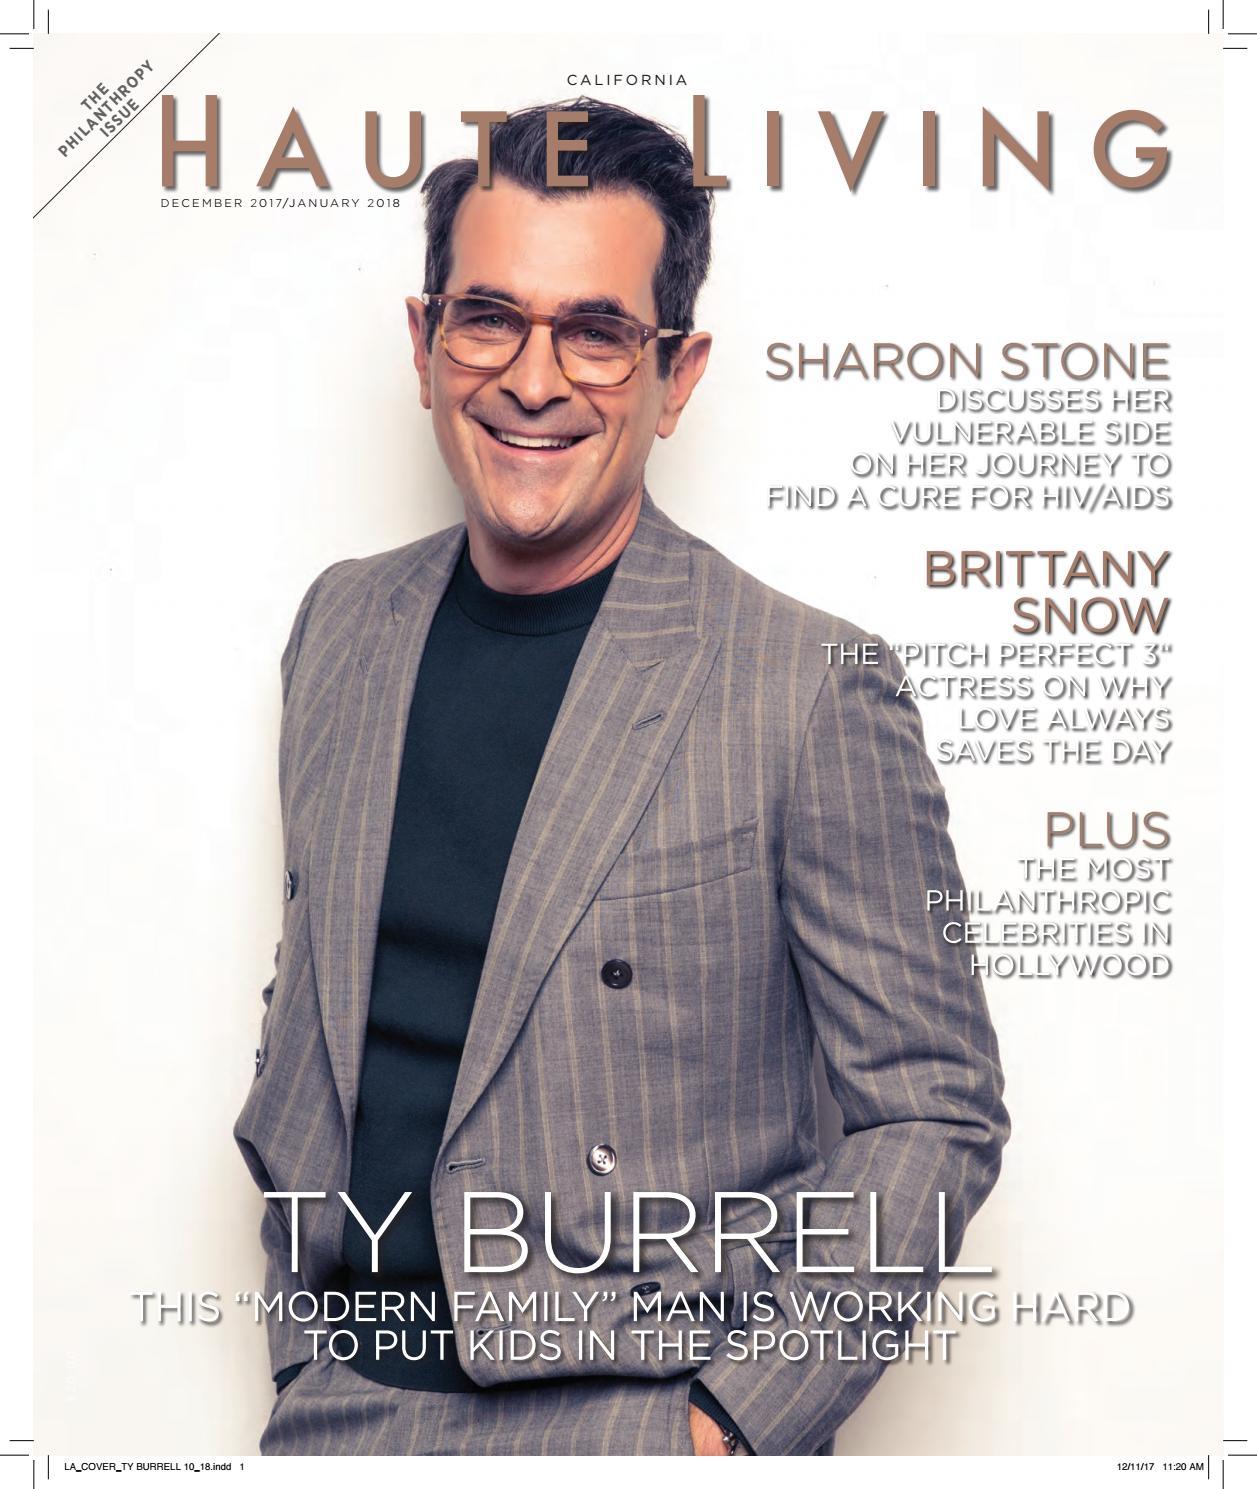 CA DEC / JAN 2018 by Haute Living - issuu